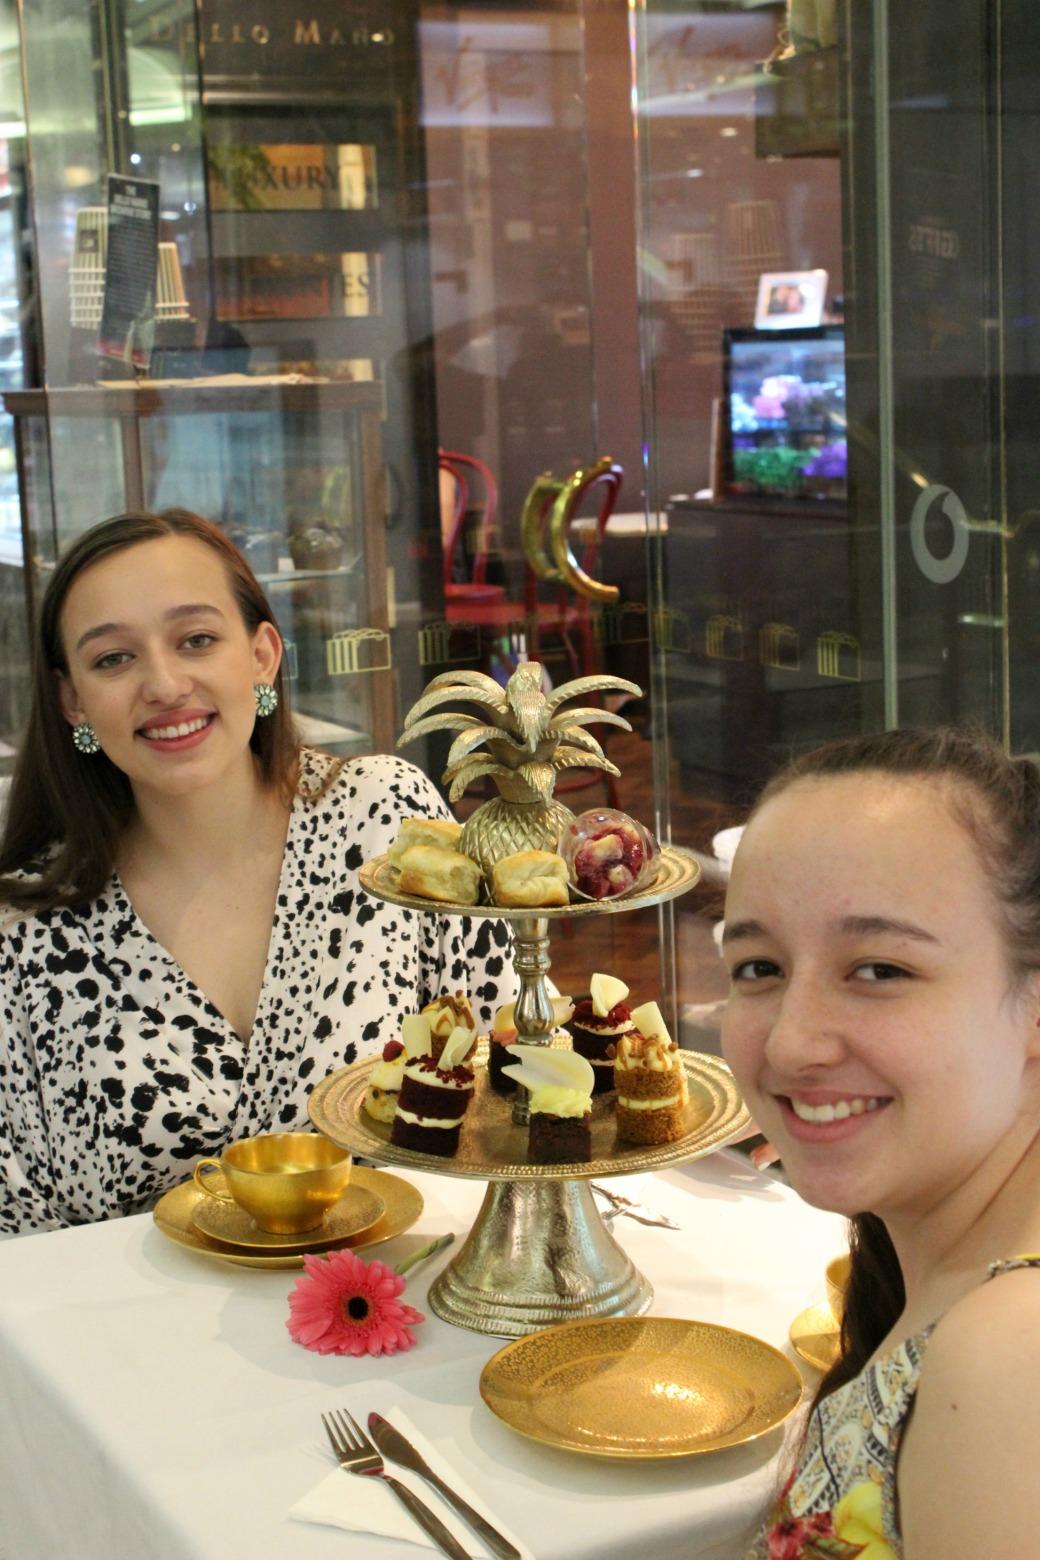 HIGH TEA BOTH GIRLS